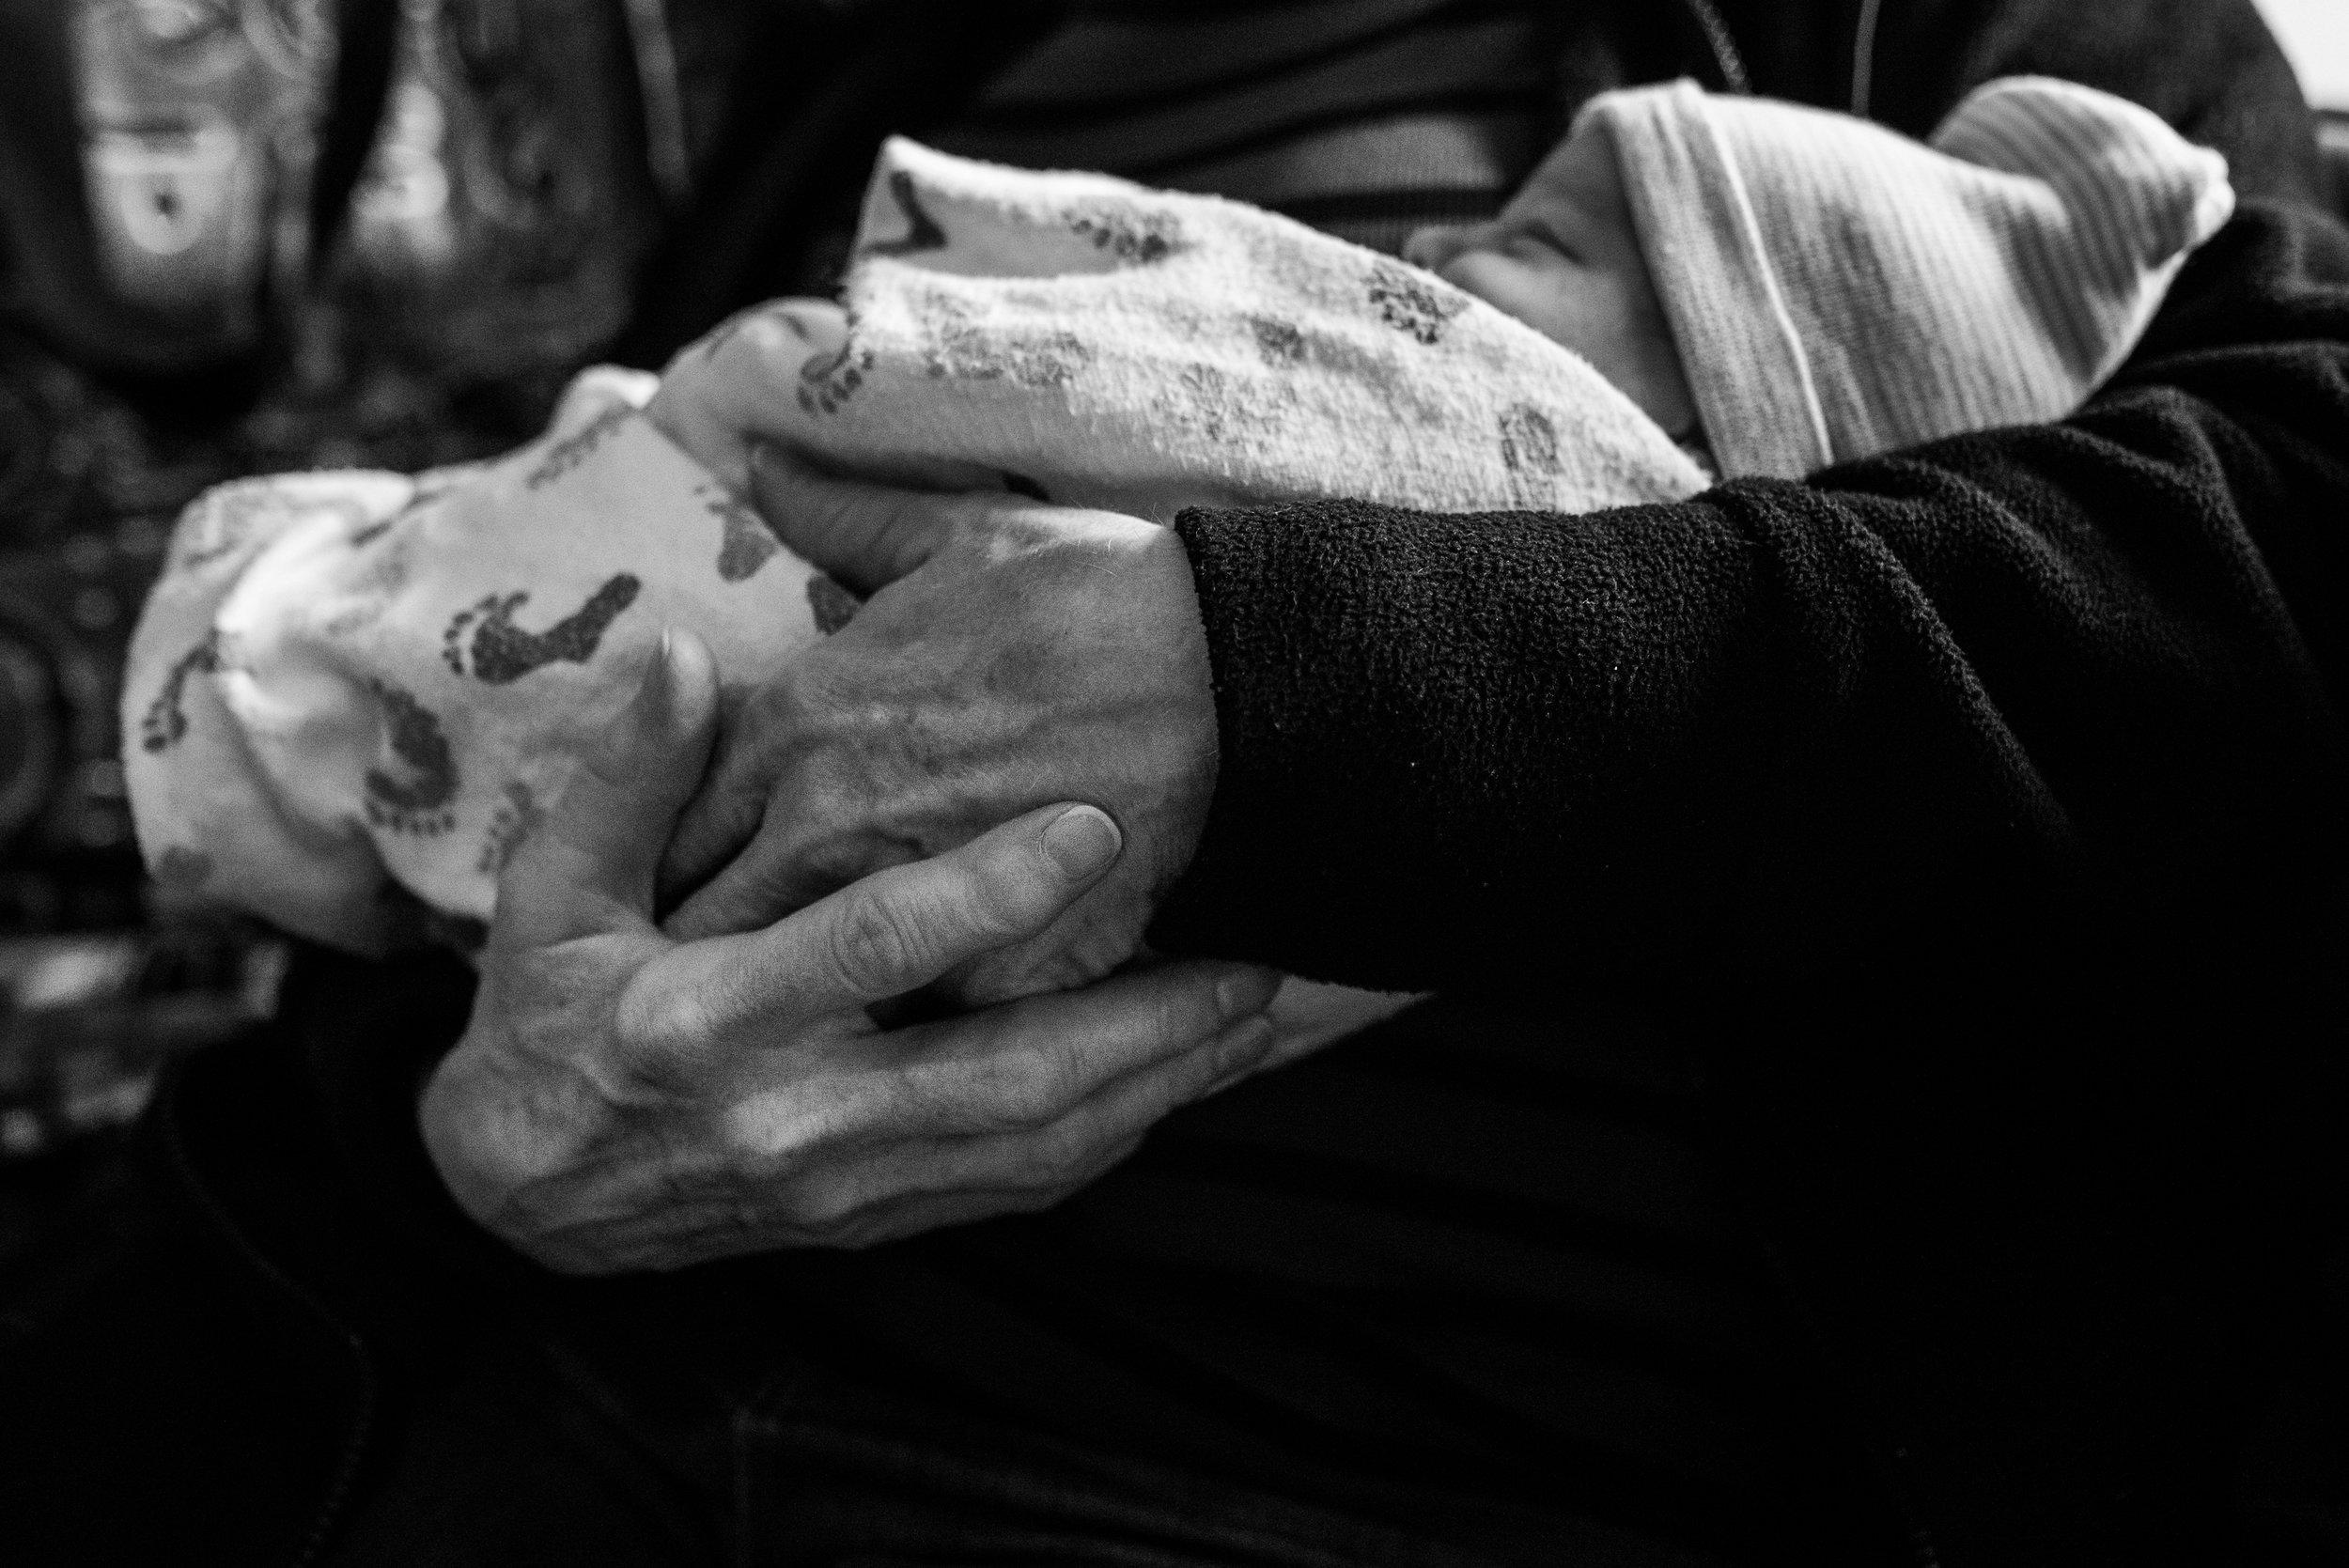 Grandma holding newborn baby in her arms